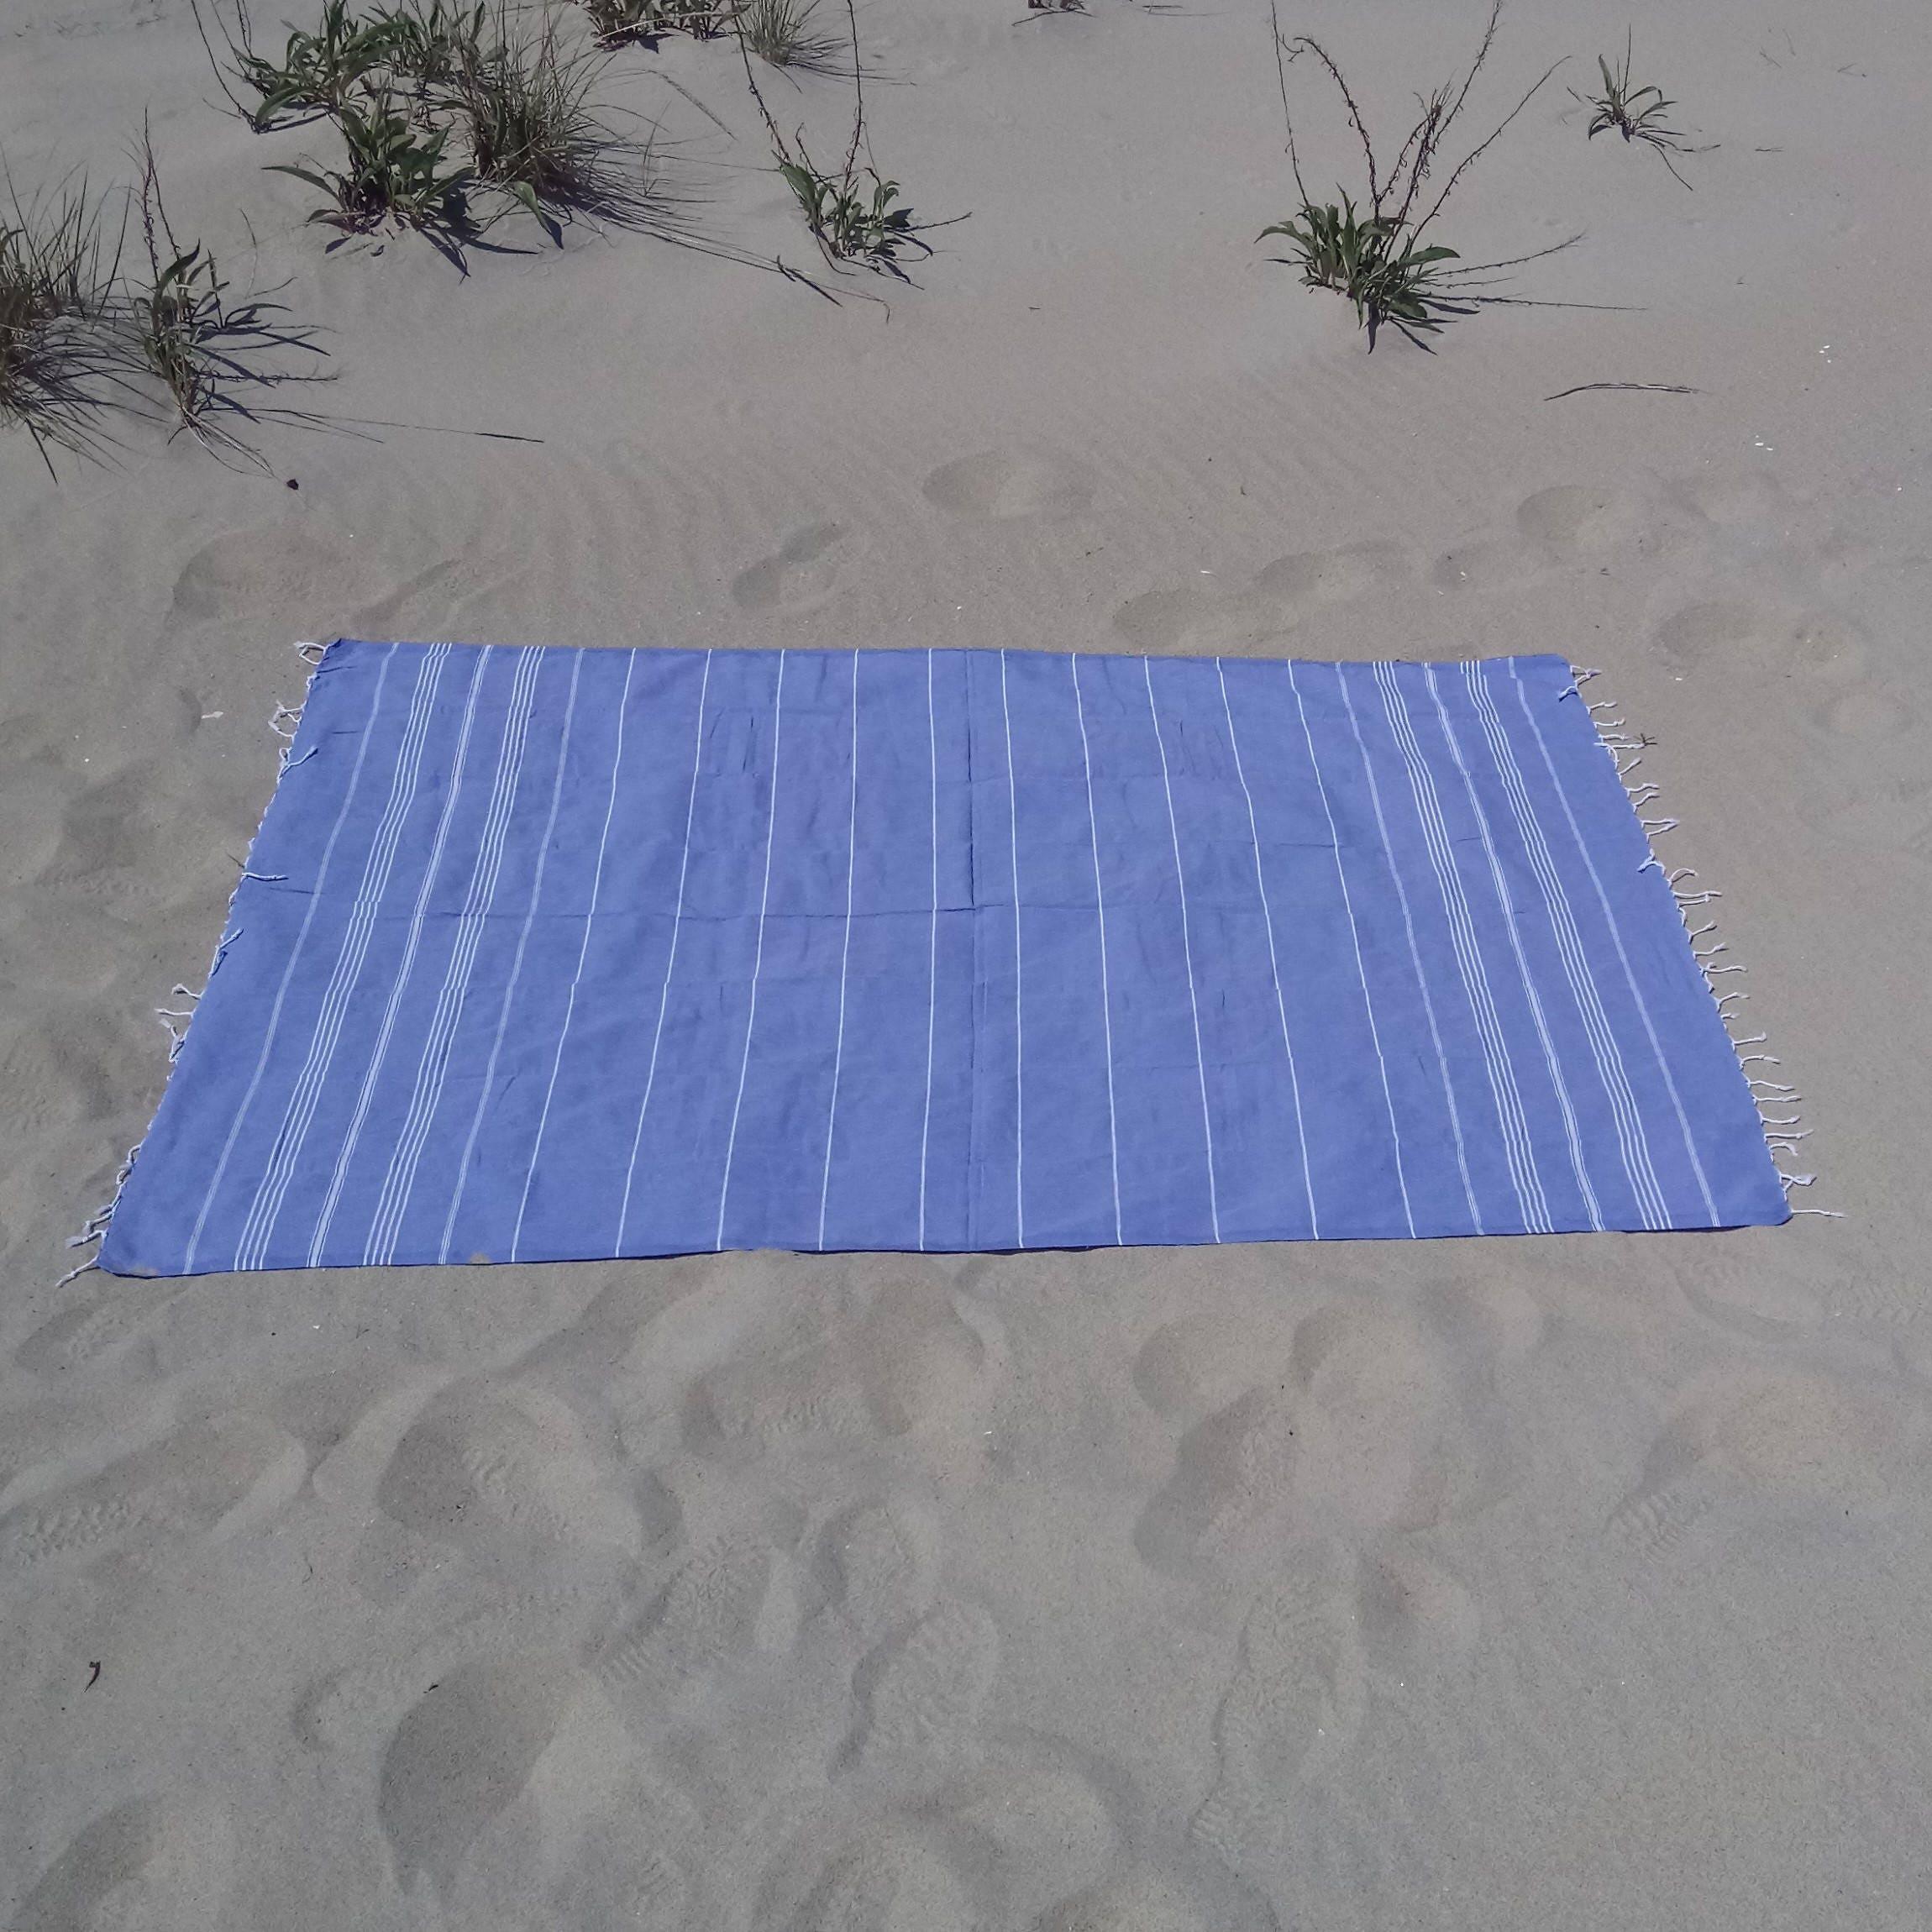 Travel Towel Japan: Maraa XL TURKISH TOWEL 100% Cotton Pestemal Travel Towel